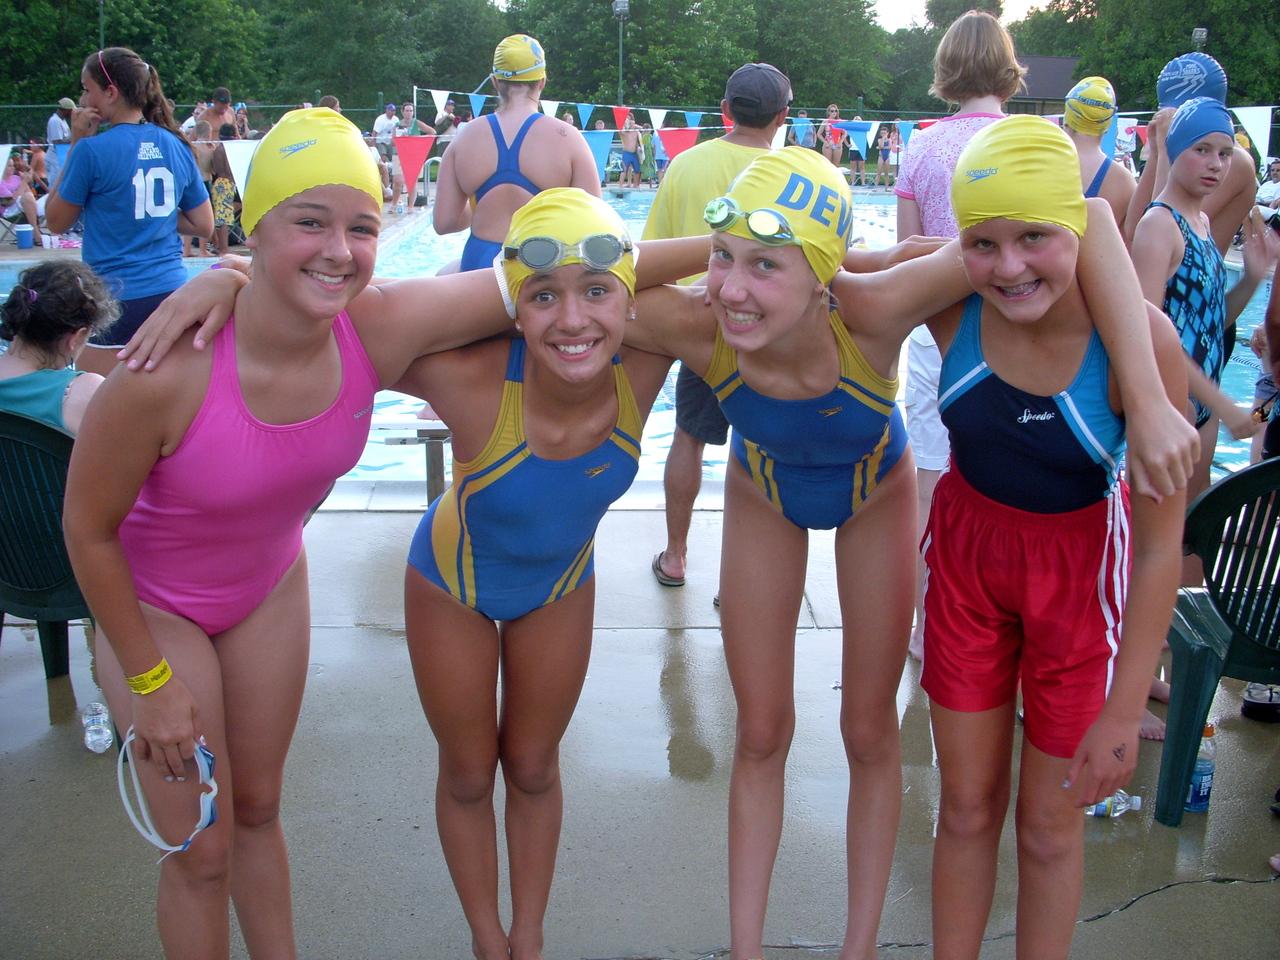 ponderosa swim meet 2010